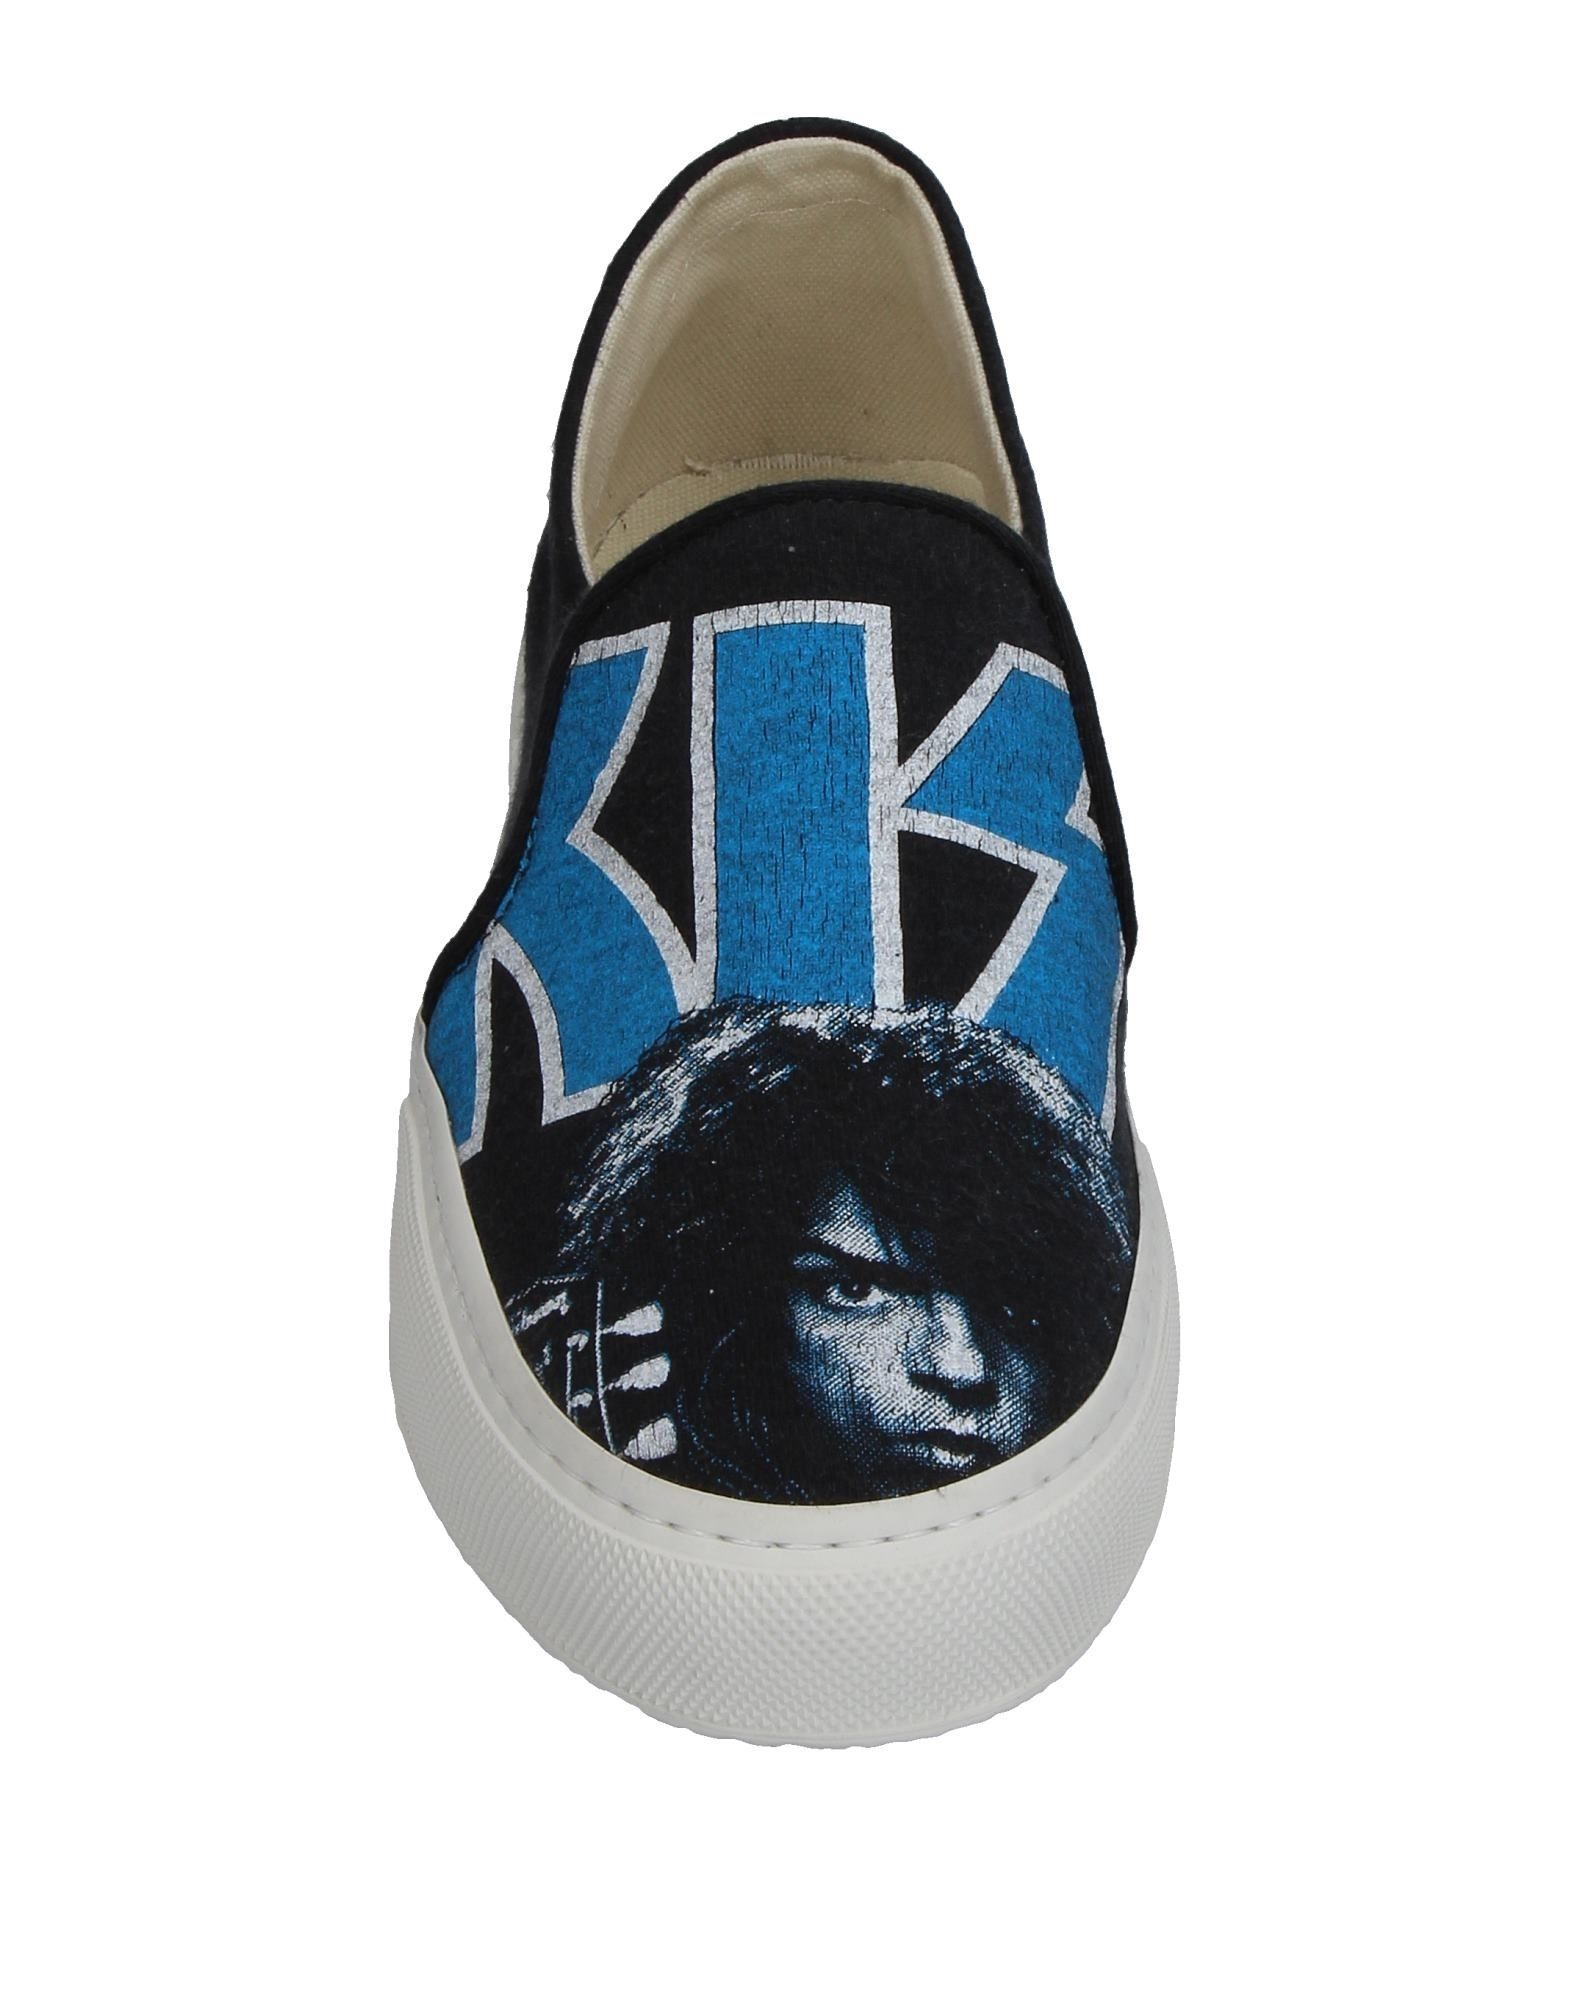 Stilvolle billige  Schuhe JoshuaS Sneakers Damen  billige 11343160AG 236469